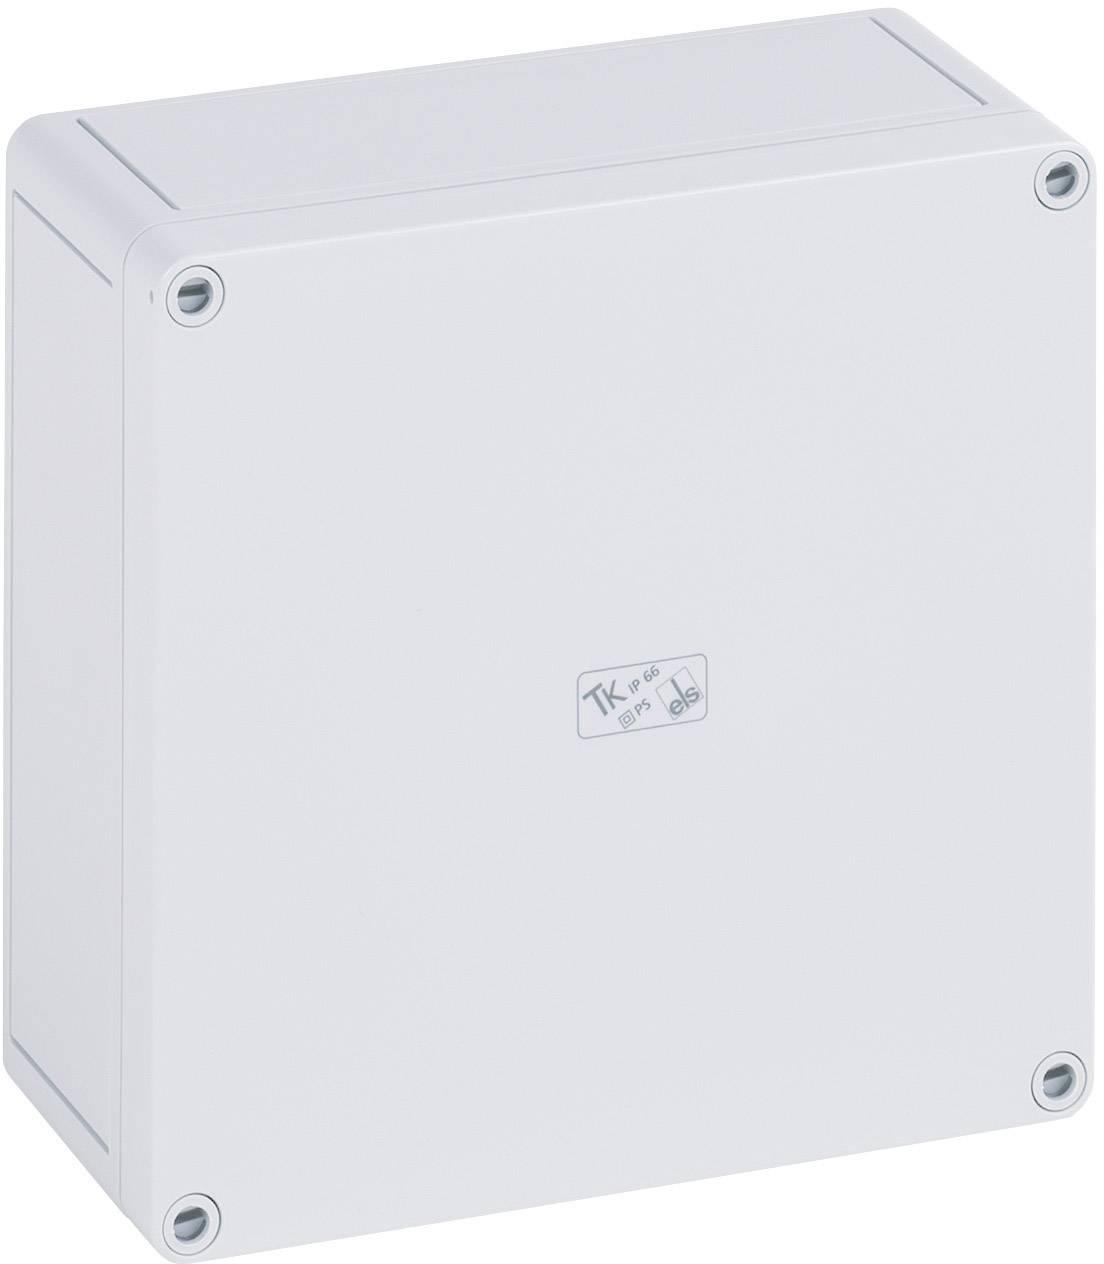 Inštalačná krabička Spelsberg TK PS 2518-8f 11091101, (d x š x v) 254 x 180 x 84 mm, polystyrén, svetlo sivá (RAL 7035), 1 ks